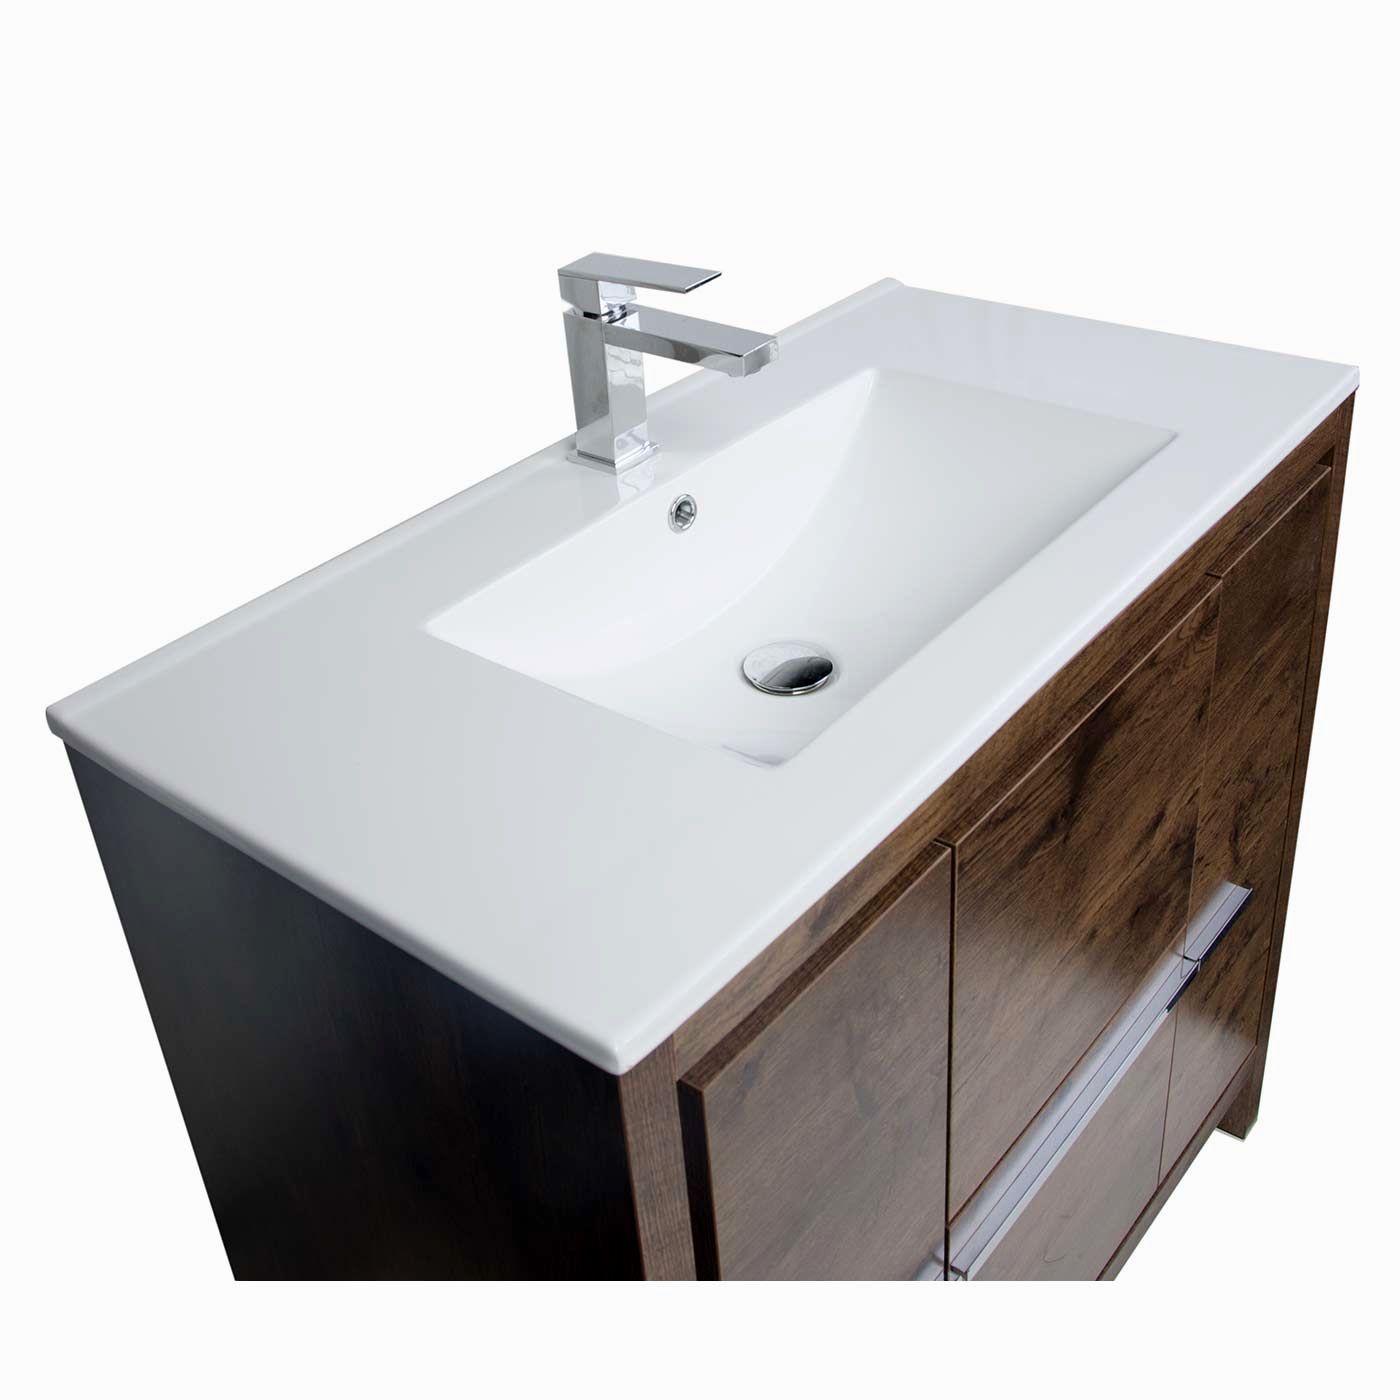 best 36 inch bathroom vanity concept-Superb 36 Inch Bathroom Vanity Inspiration